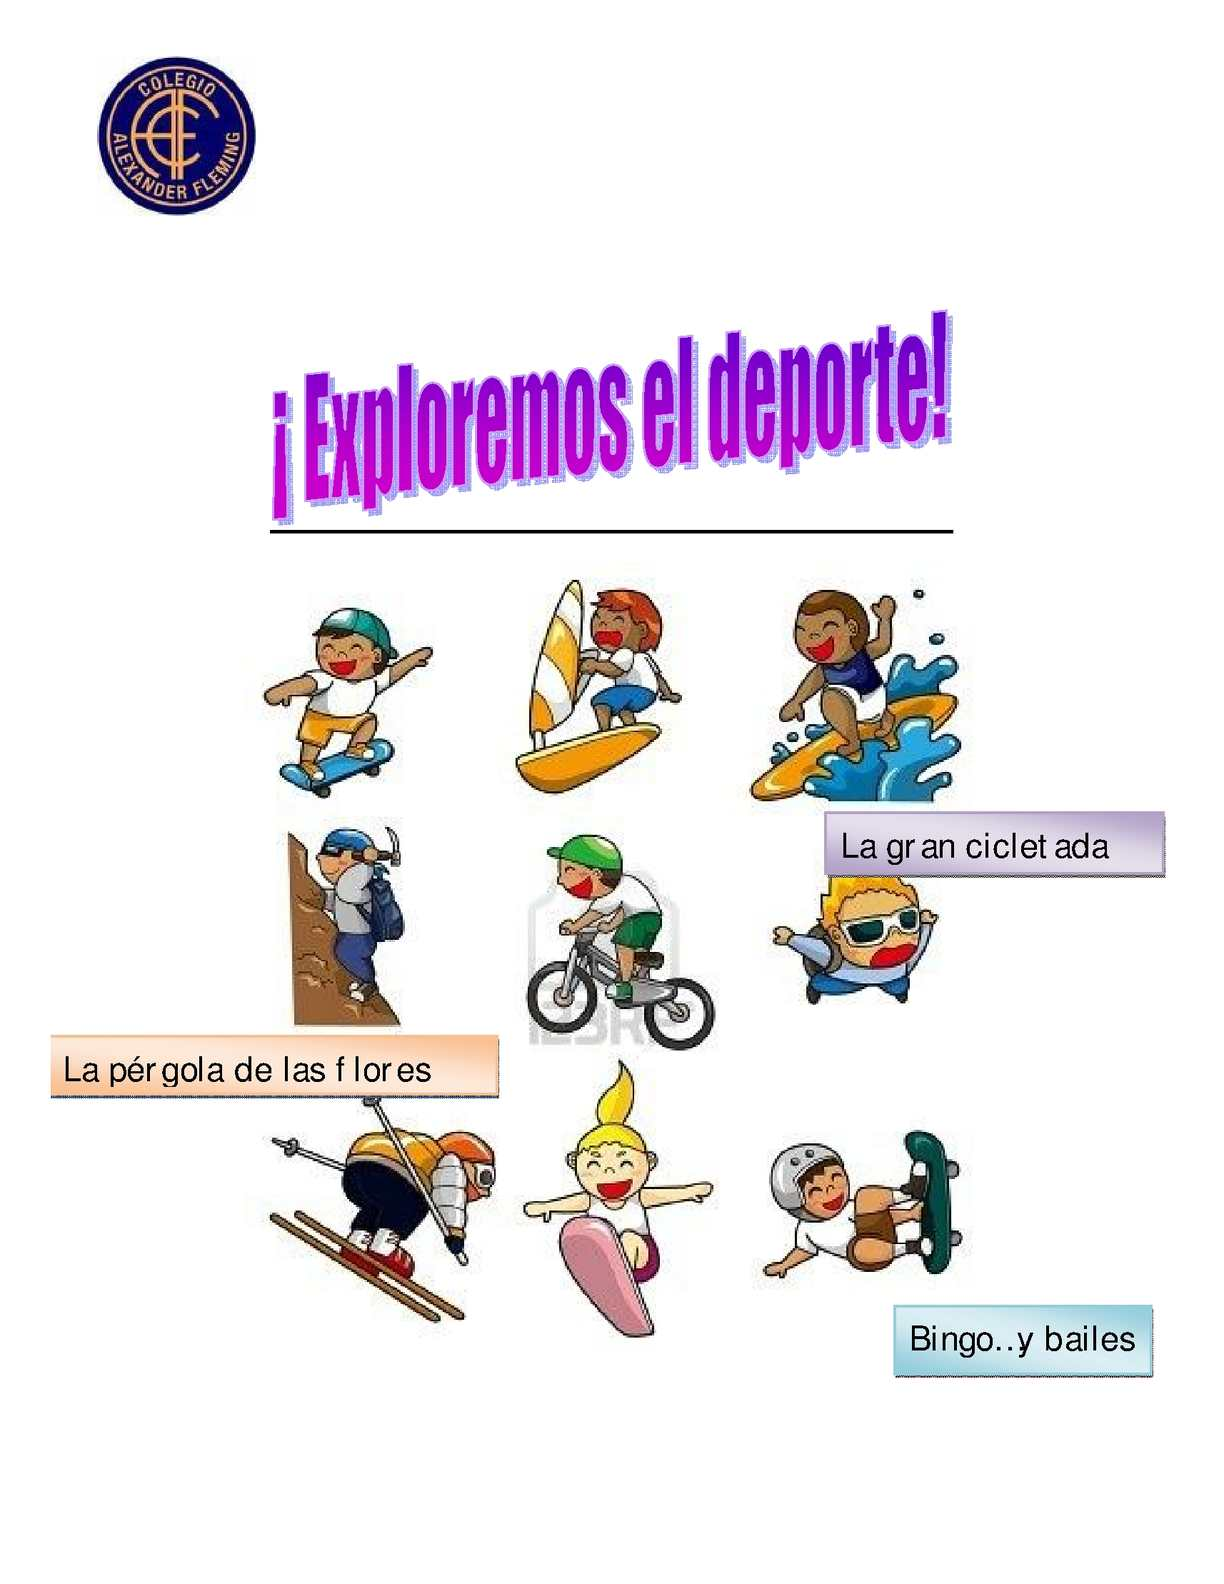 Calaméo - Exploremos el deporte 64dfc676fb73c